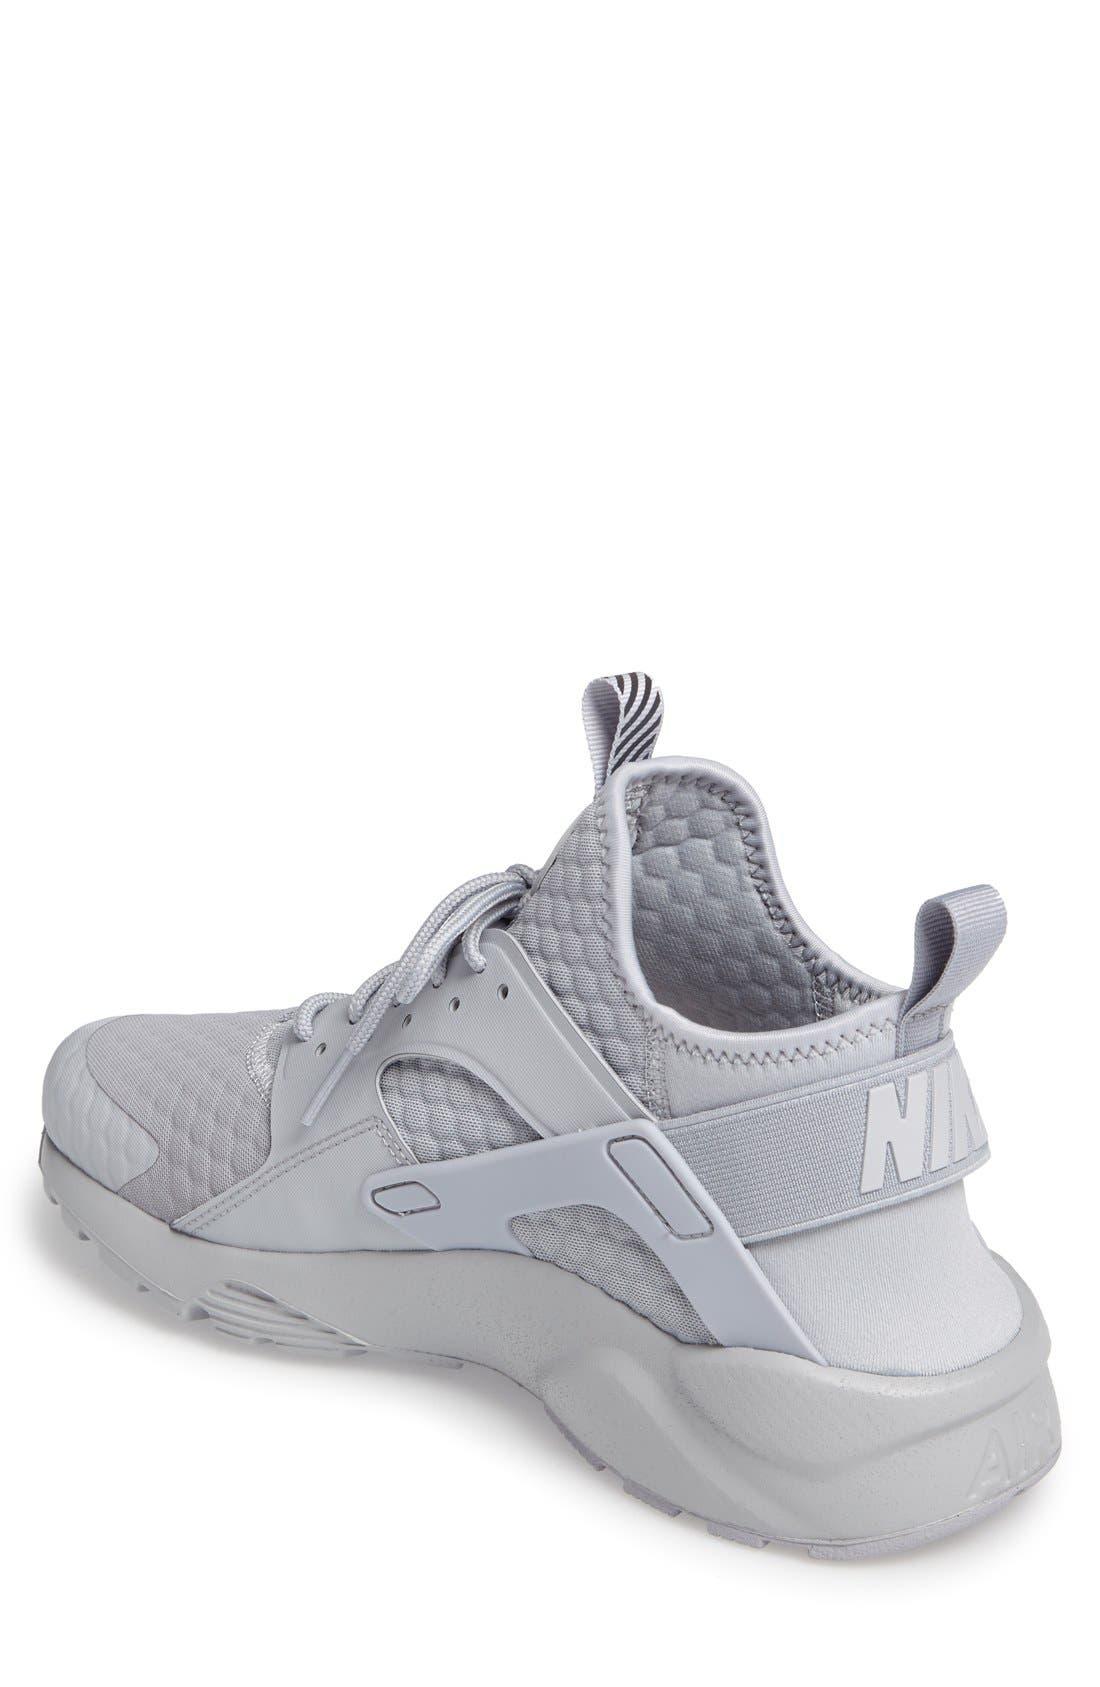 Alternate Image 2  - Nike Huarache Run Ultra SE Premium Sneaker (Men)